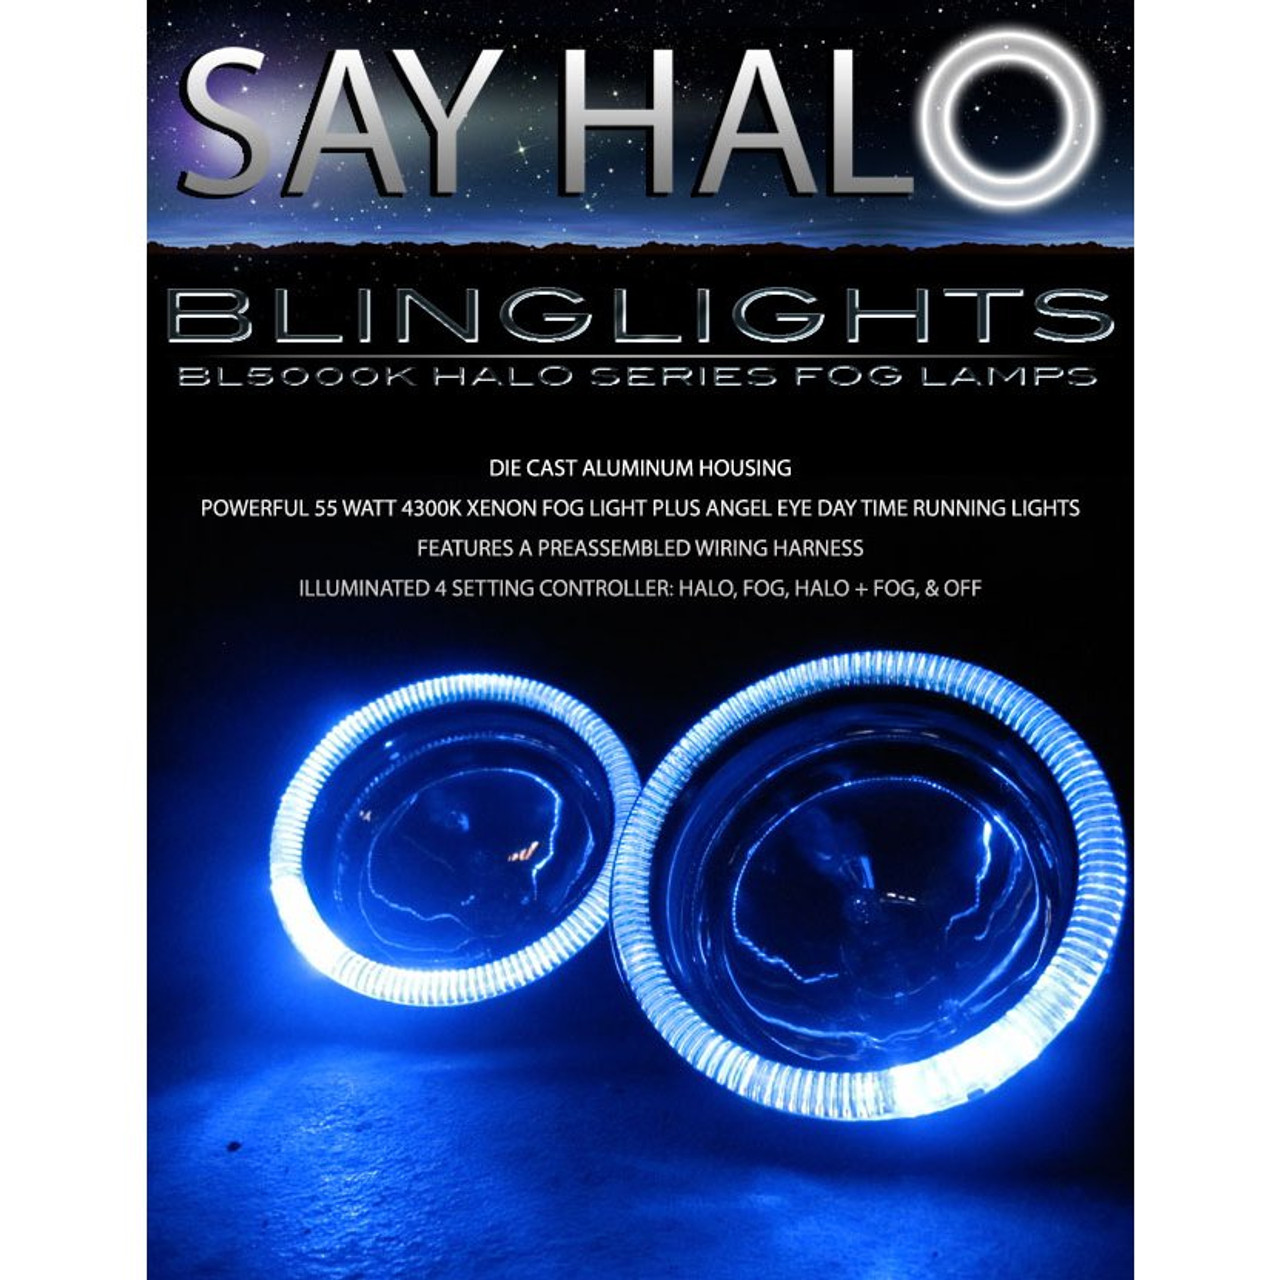 2003 2004 Toyota Hilux Halo Fog Lamps Angel Eye Driving Lights Foglamps Foglights Kit